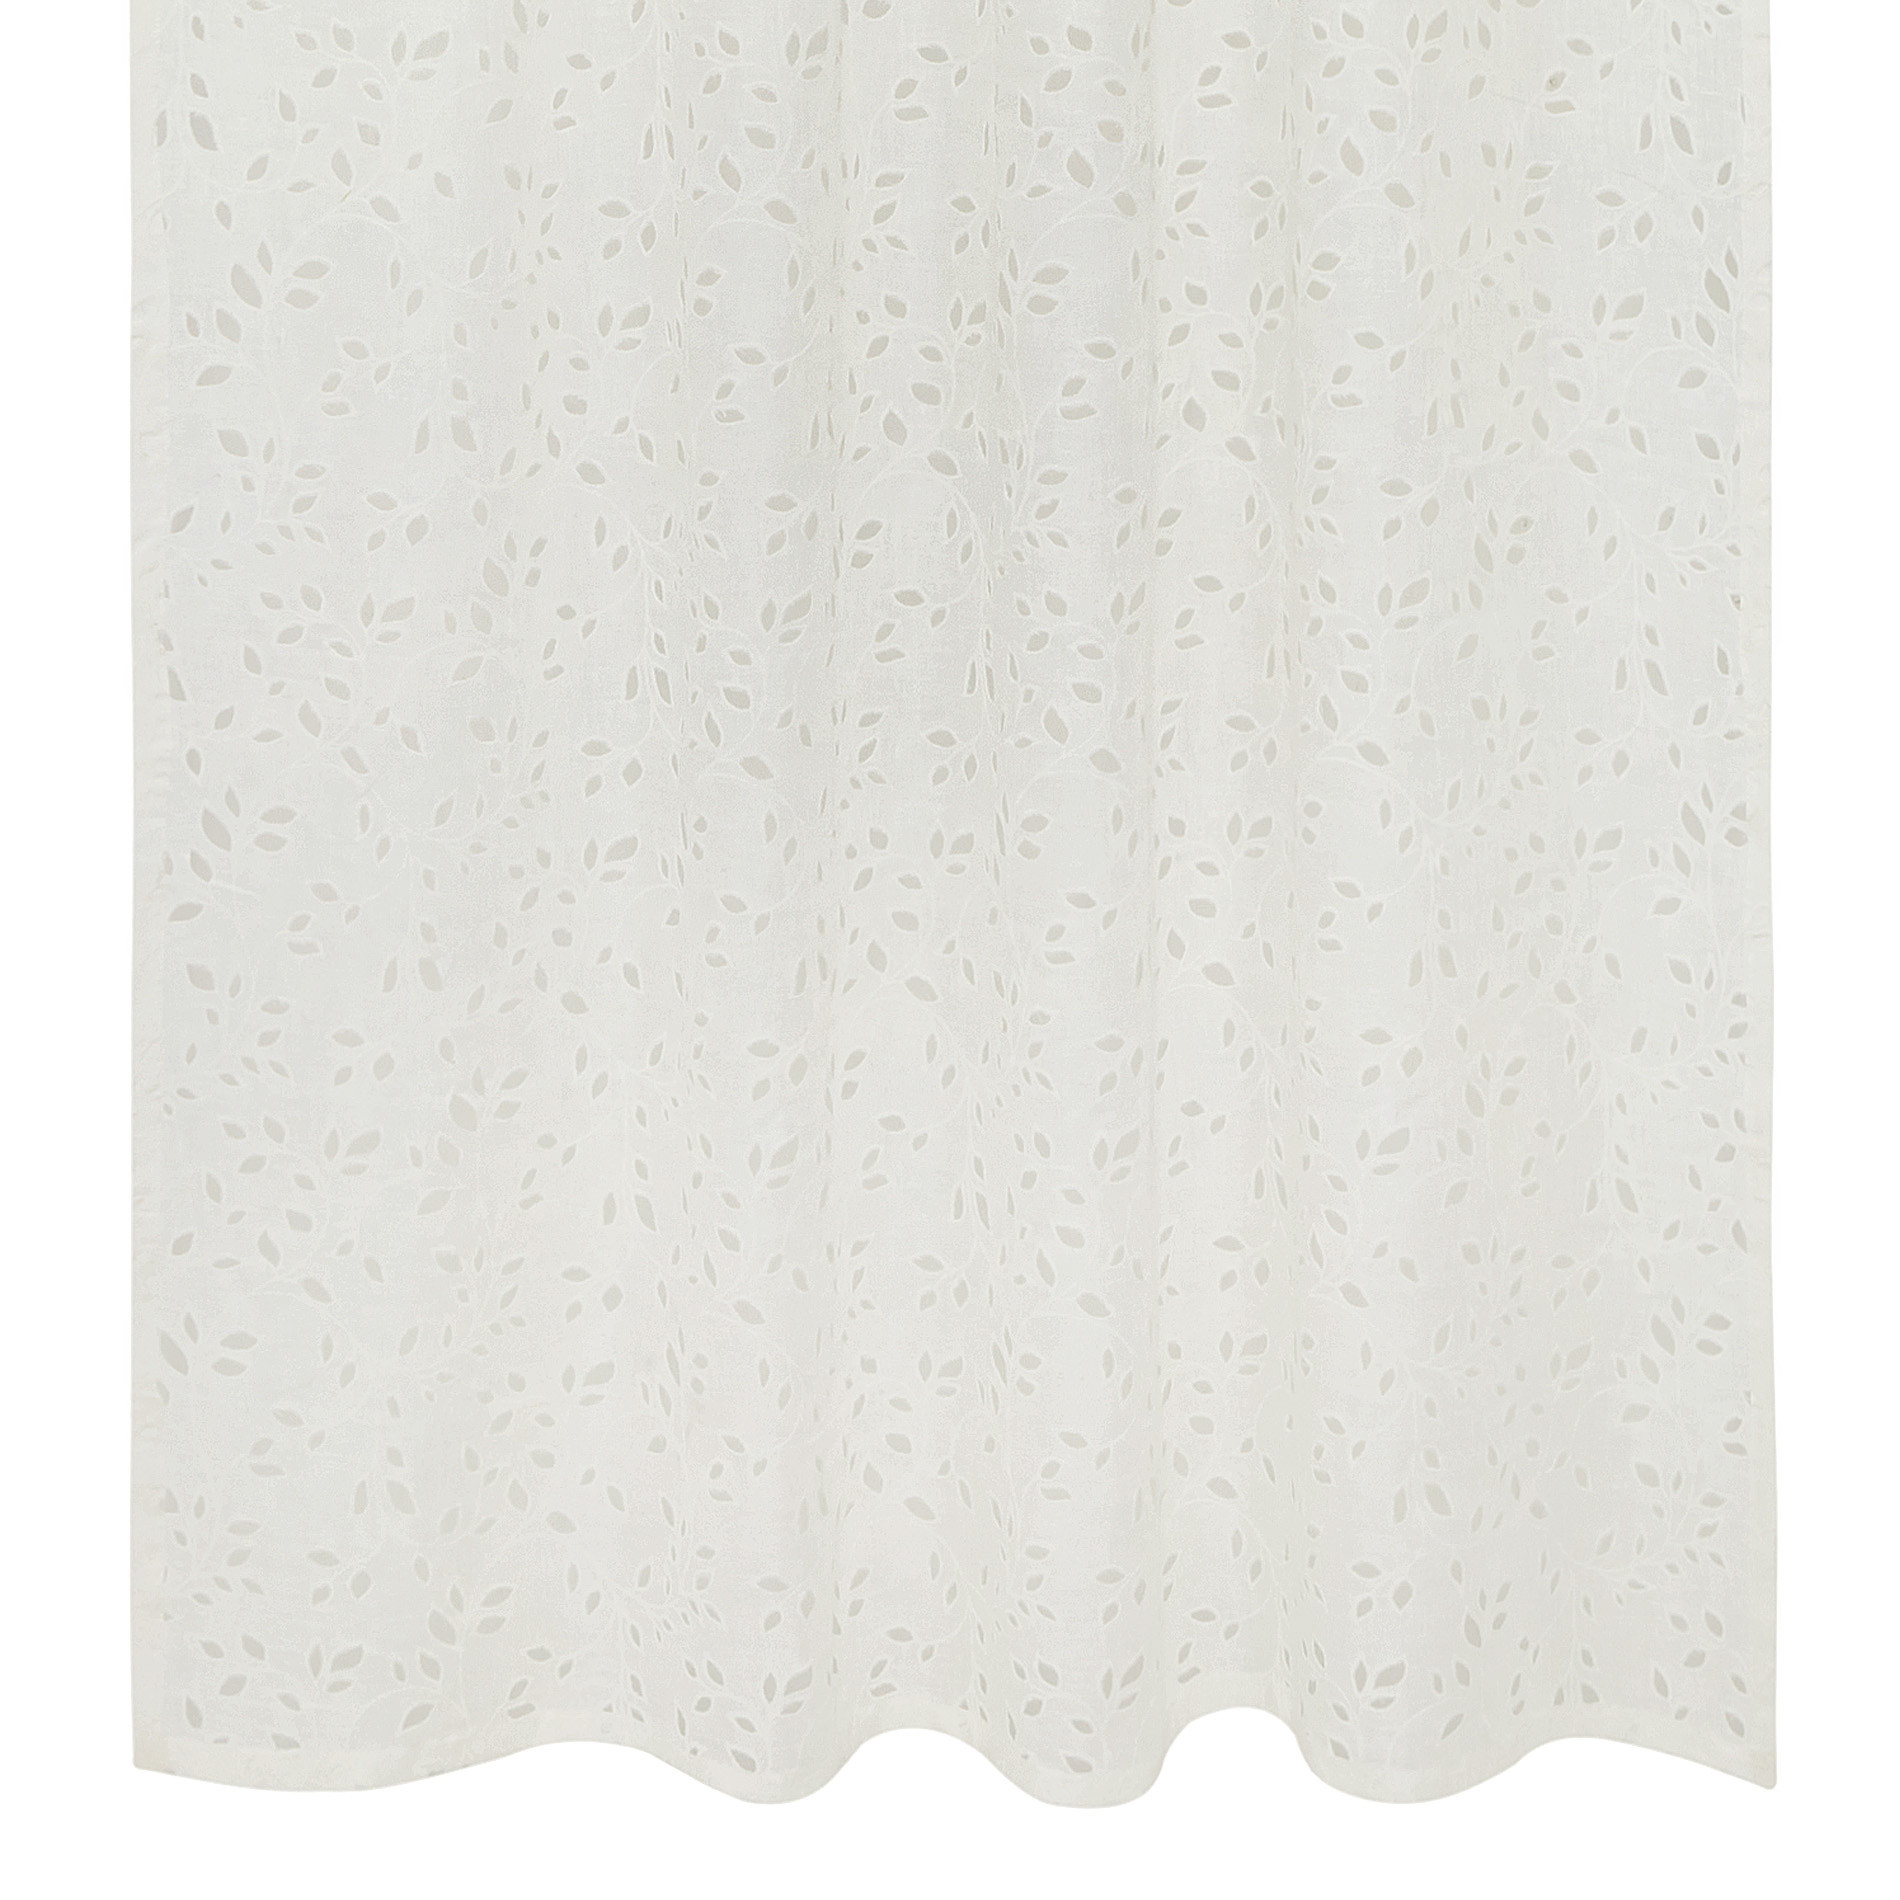 Tenda lino sangallo passanti nascosti, Bianco, large image number 1